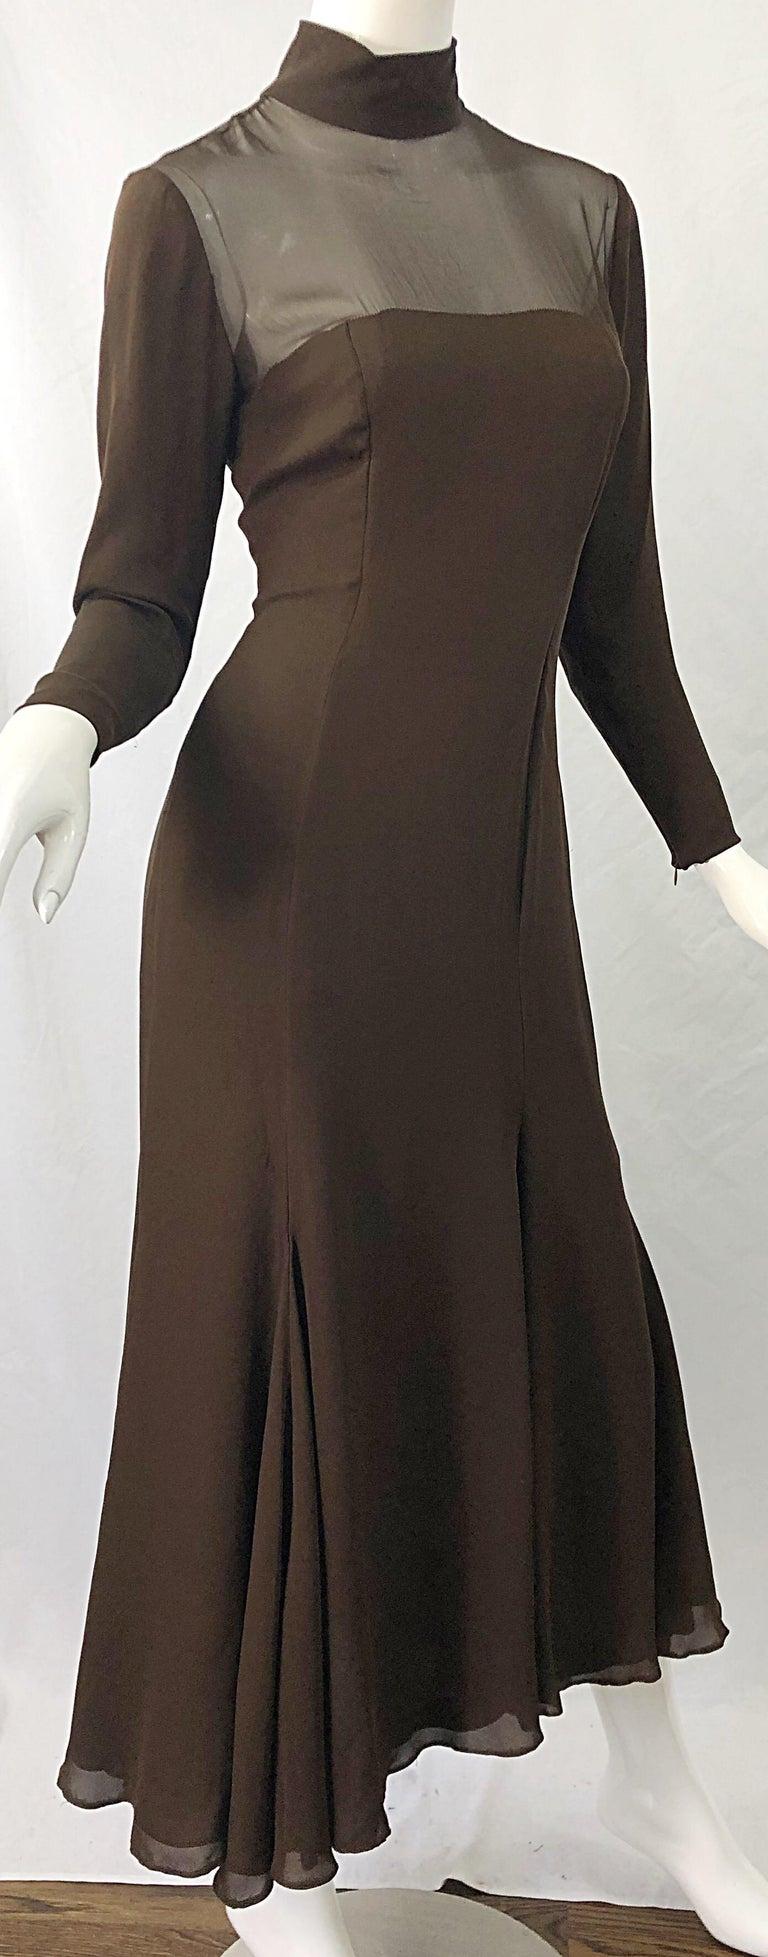 1970s Nolan Miller Couture Chocolate Brown Silk Chiffon Vintage 70s Midi Dress For Sale 4